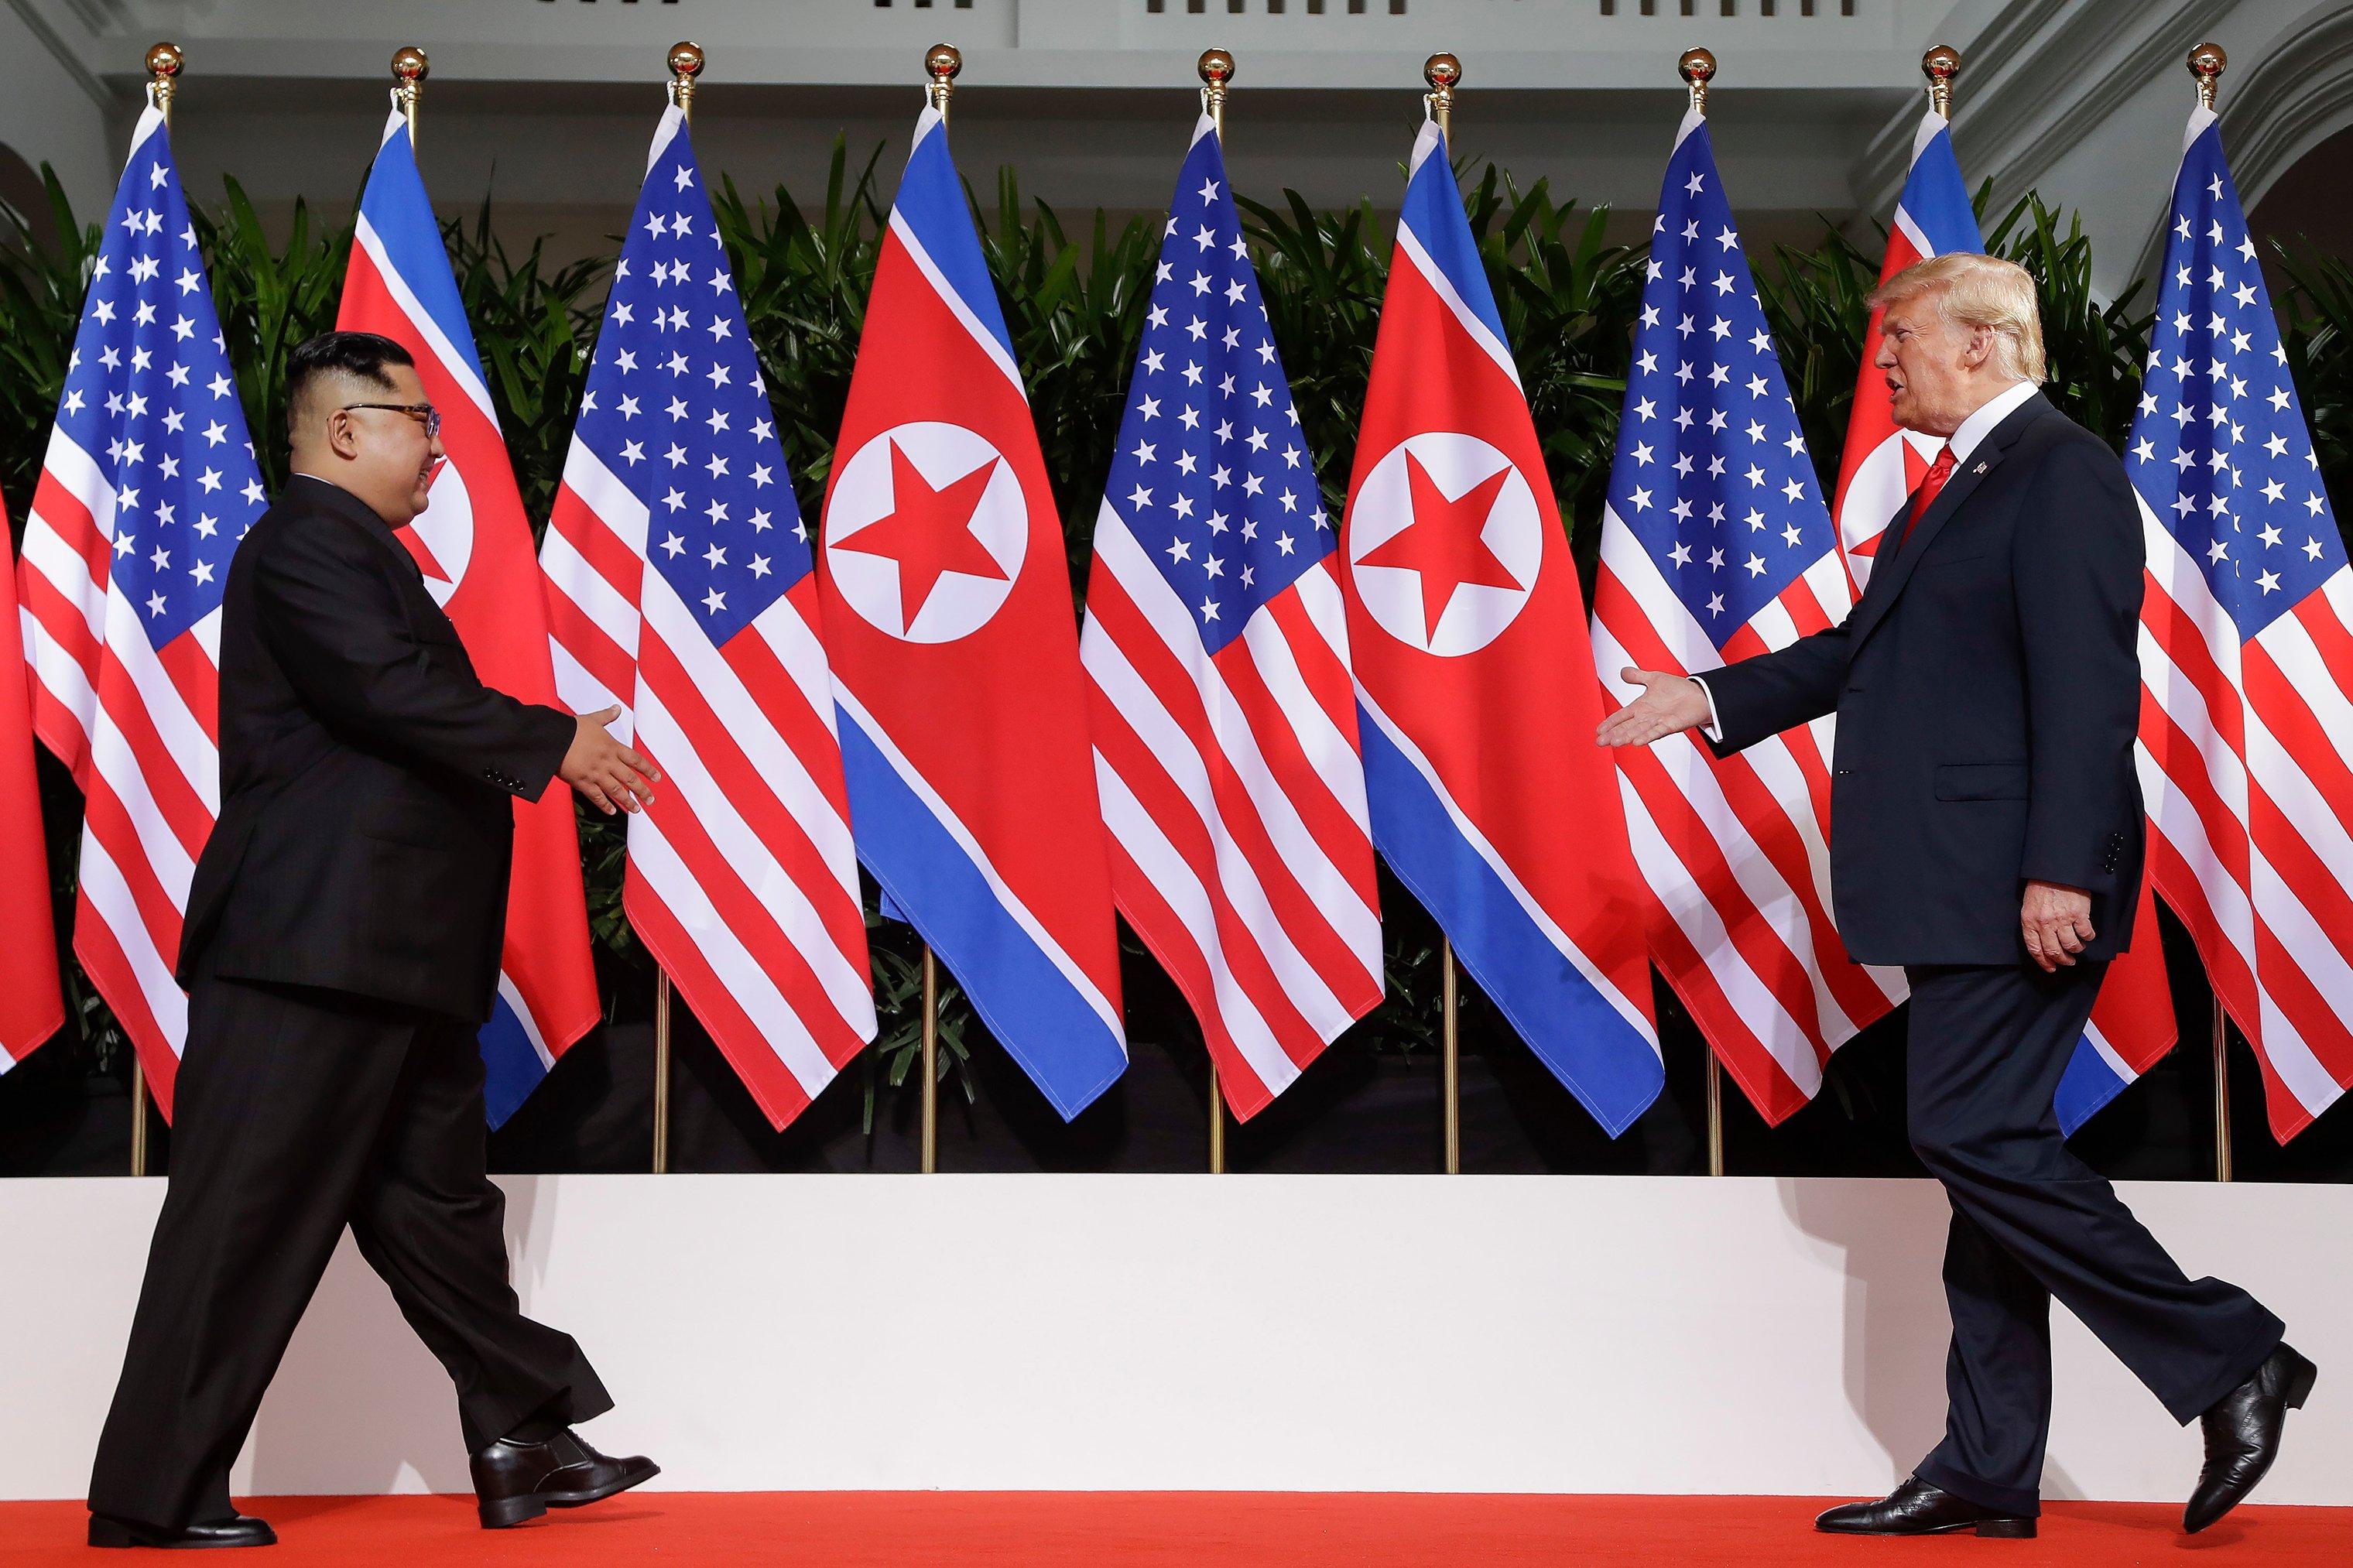 donald-trump-kim-jong-un-meeting-walk